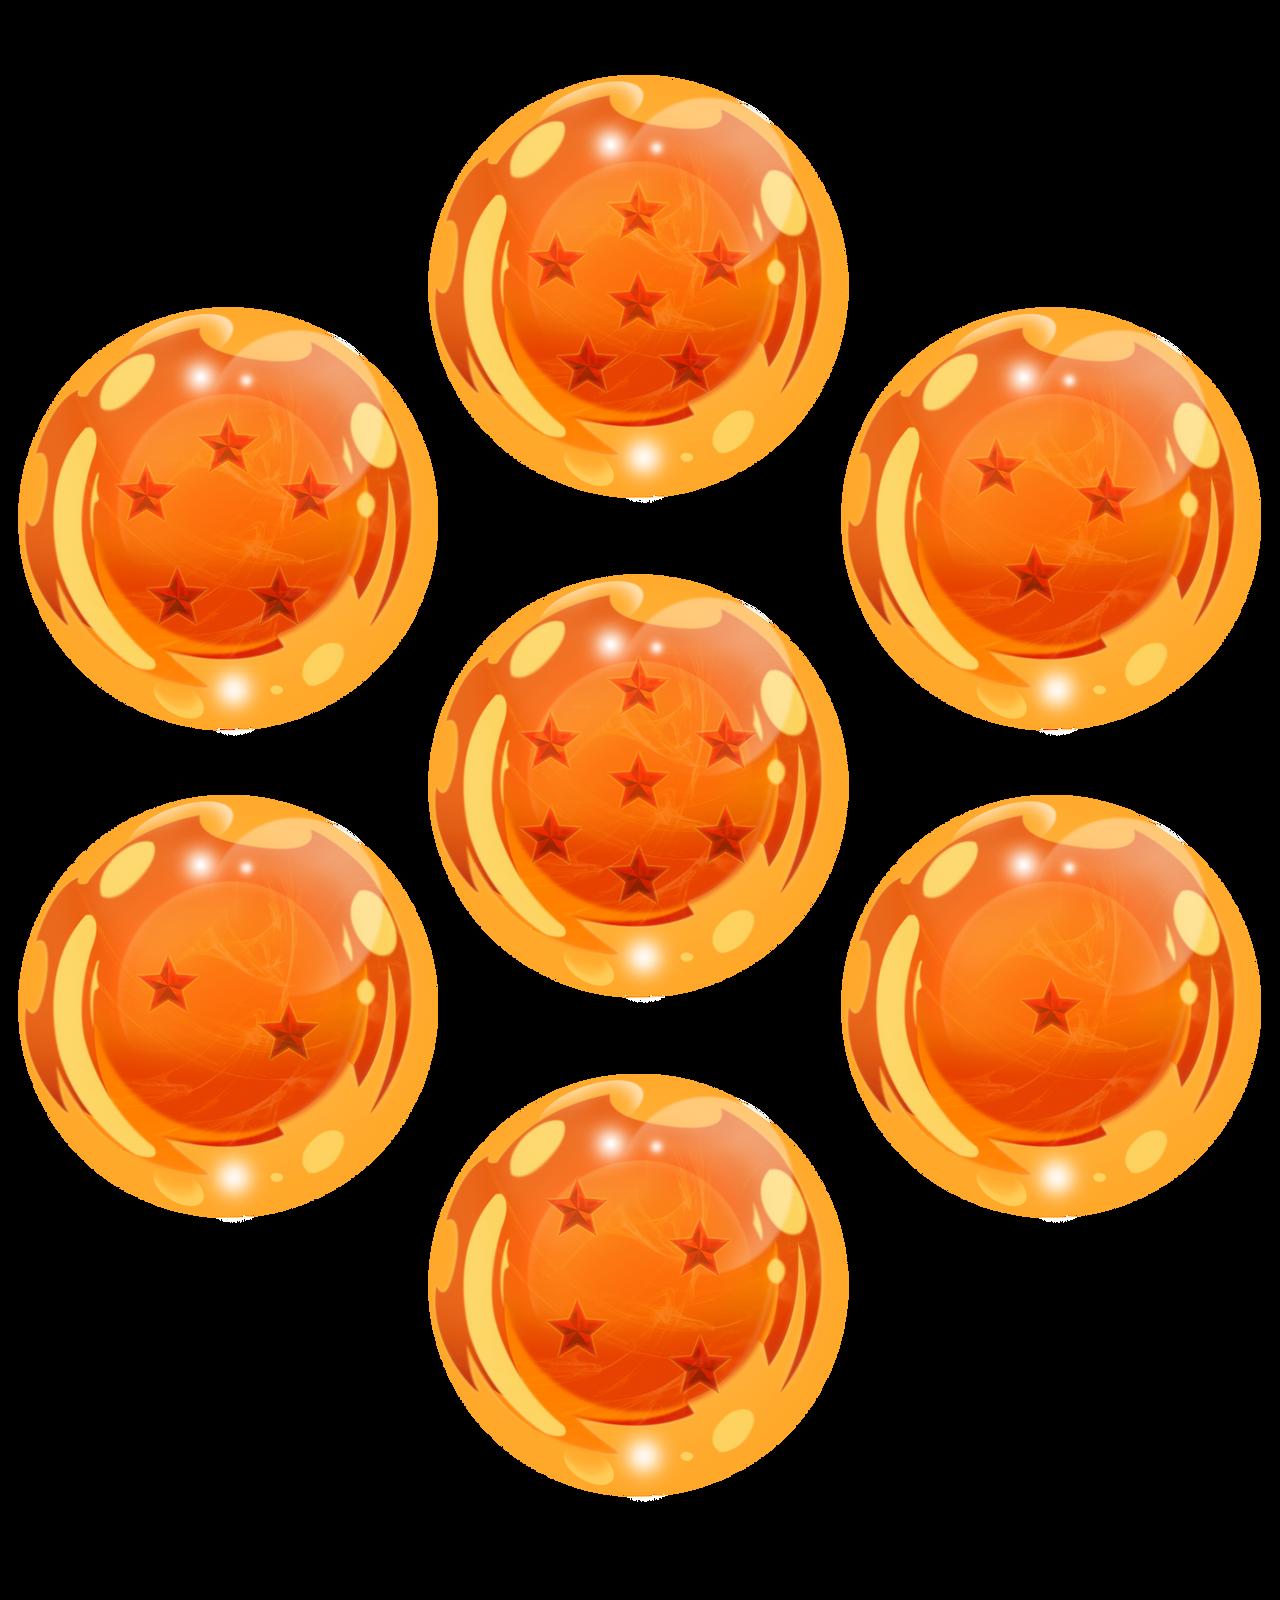 dragon ball z 7 dragon balls png tumblr